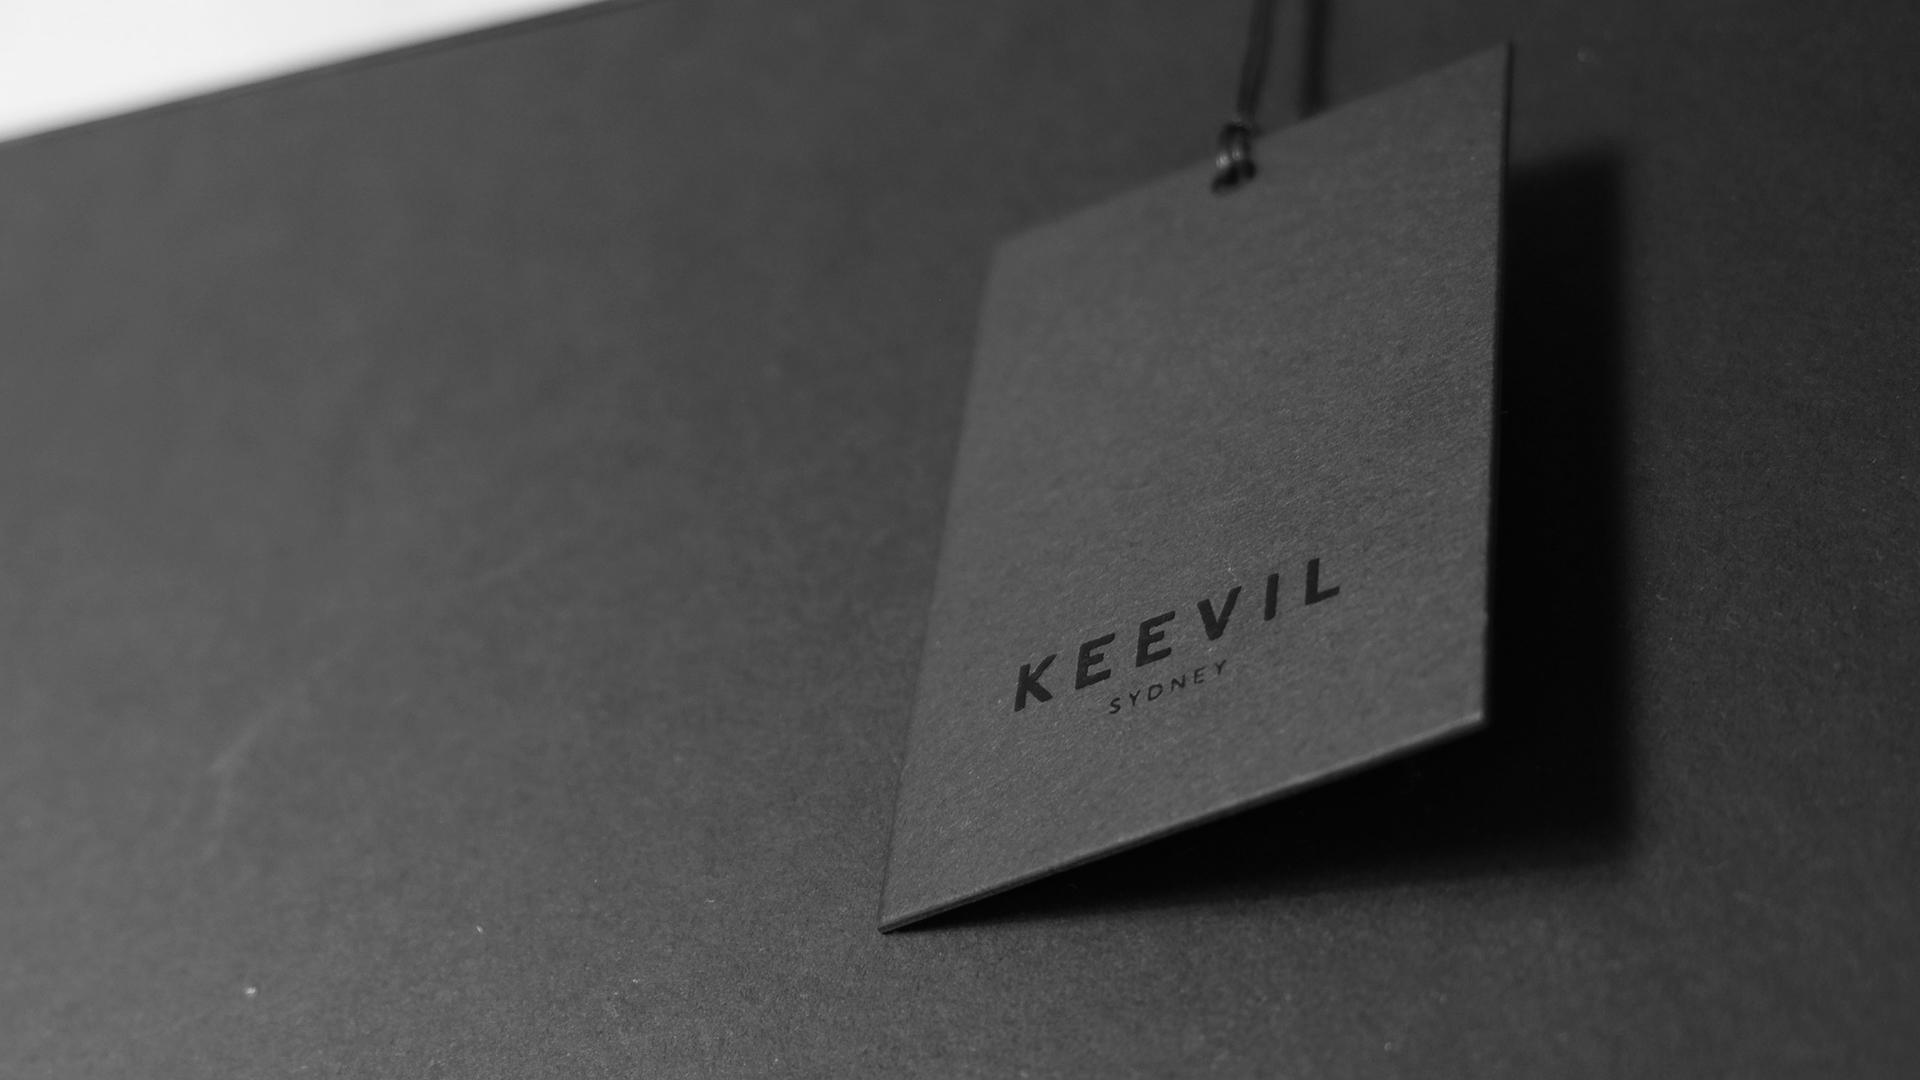 keevil.psdArtboard 1 copy 2_2.jpg